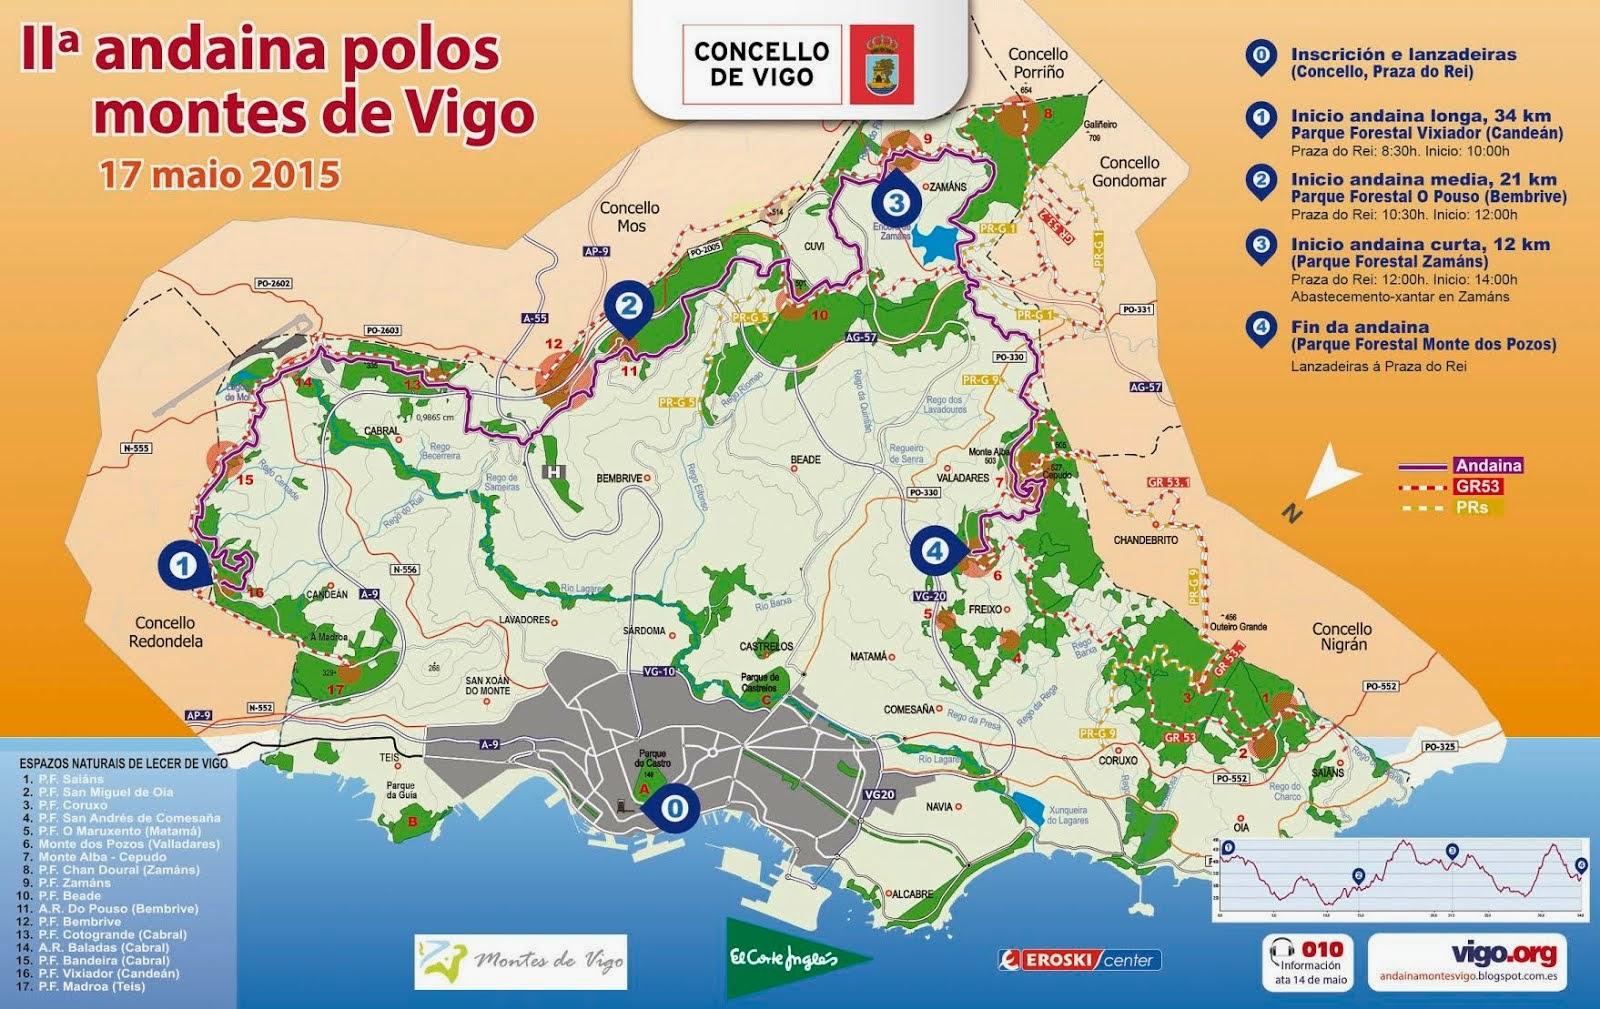 IIª Andaina polos montes de Vigo